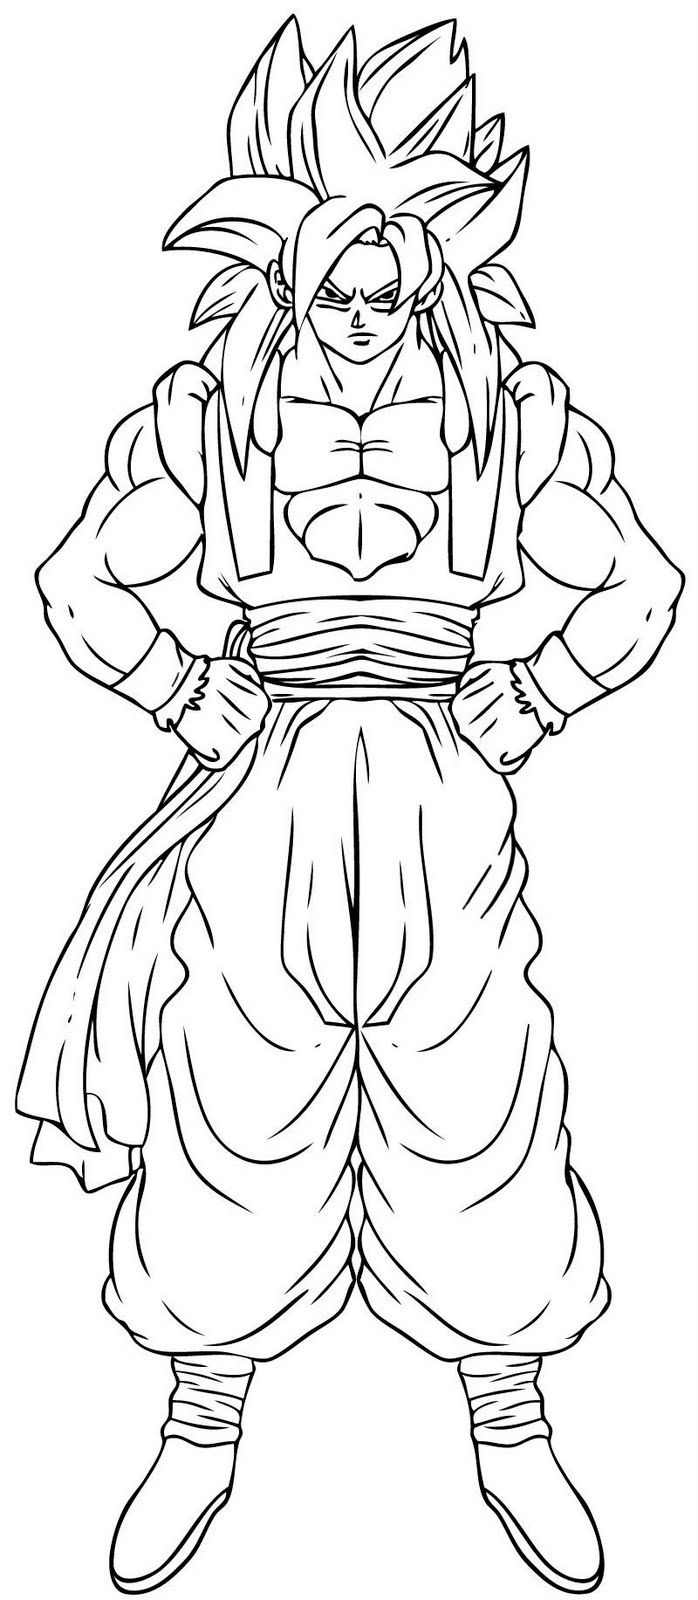 Immagini Da Colorare Di Dragon Ball Topmanga Anime E Manga